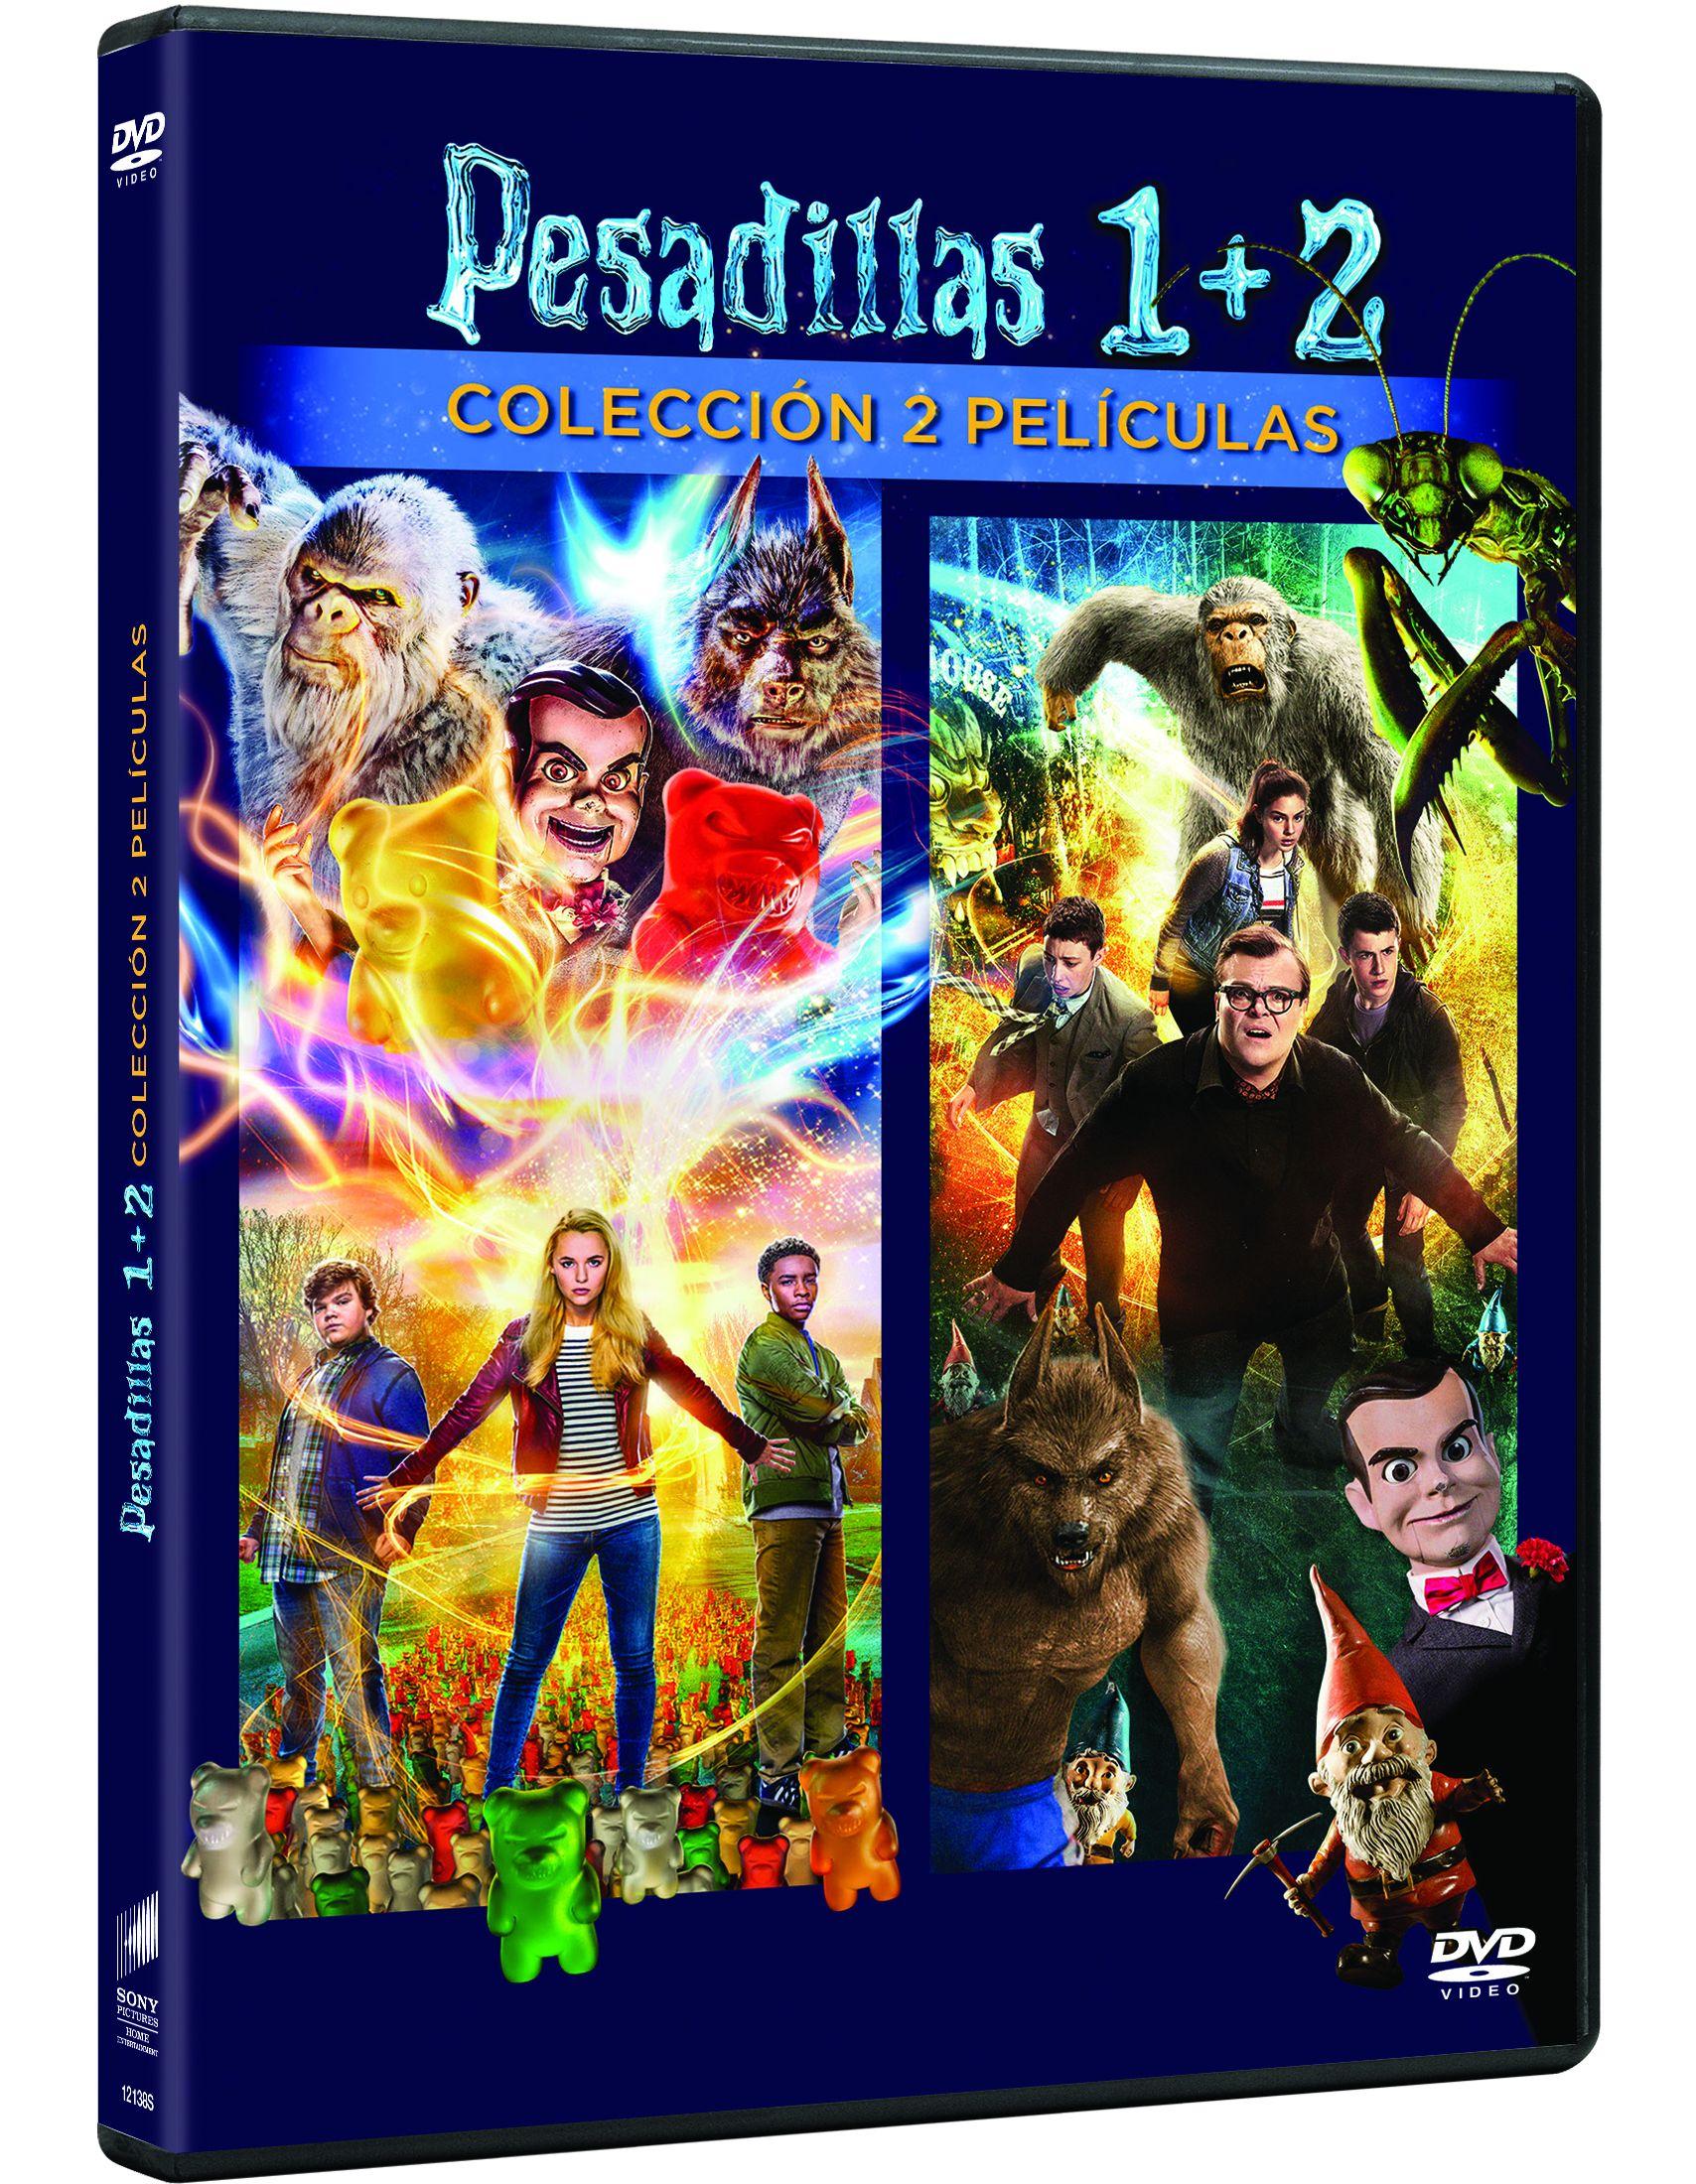 pack pesadillas 1-2 - dvd --8414533121385